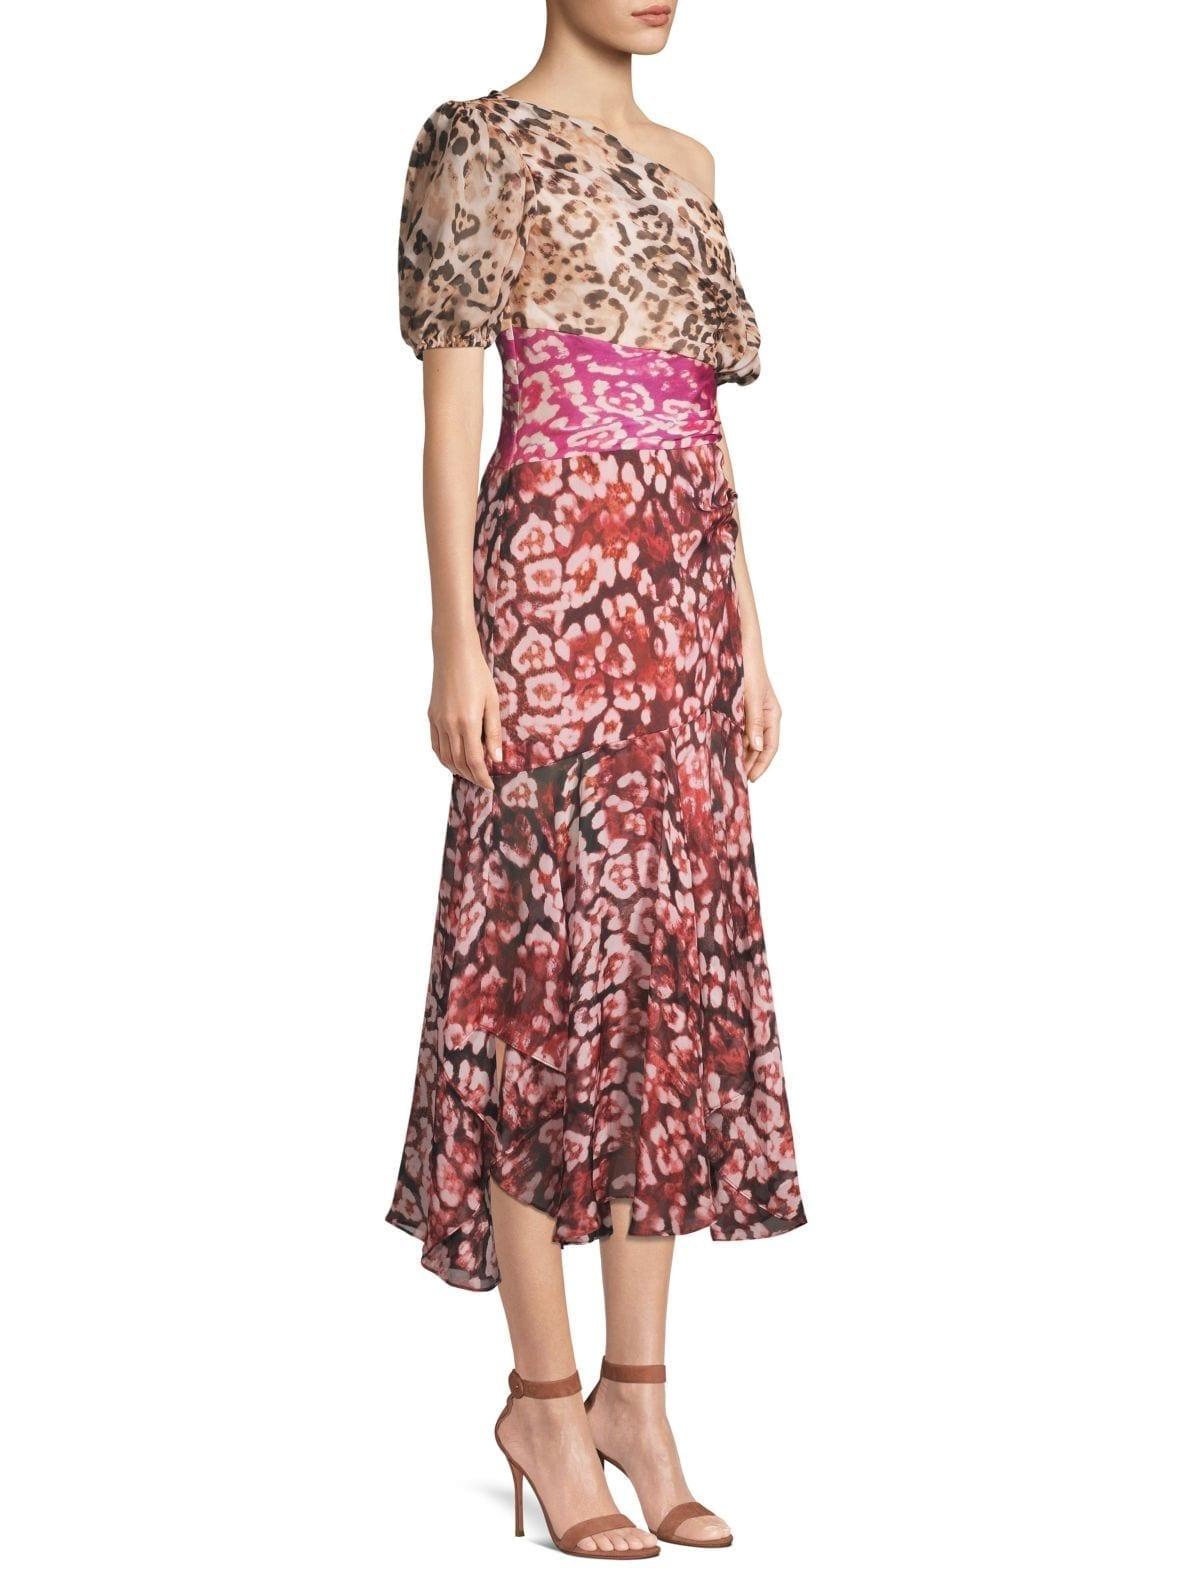 31833ba222 AMUR Jaylah Silk Chiffon One-Shouldered Multicolored Dress - We ...